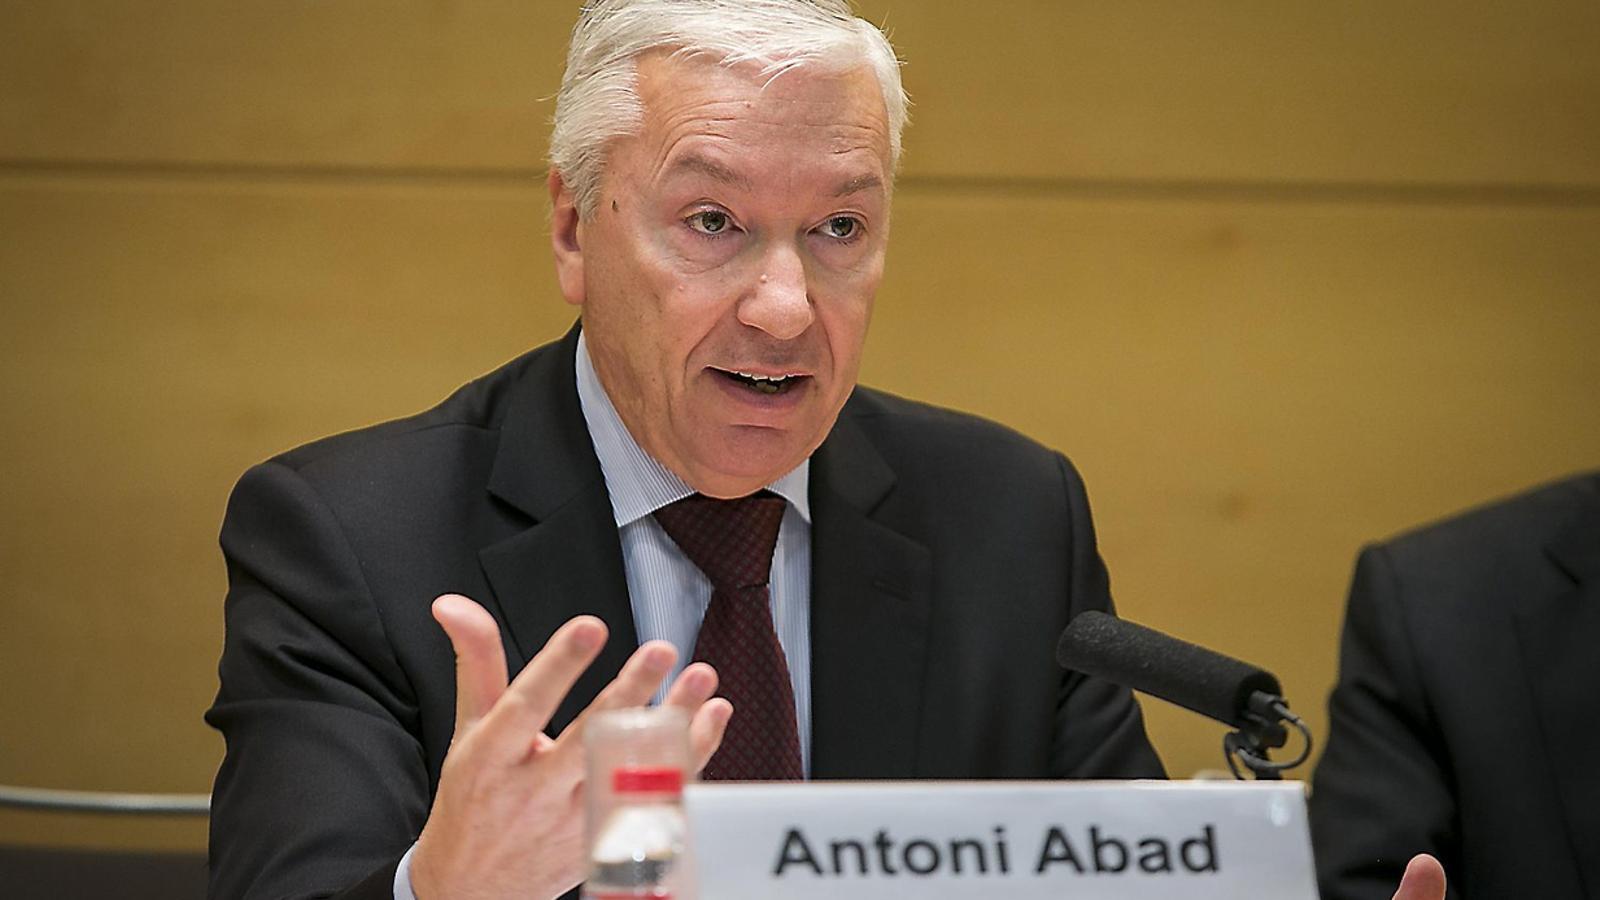 Antoni Abad anuncia la seva renúncia a presidir Foment